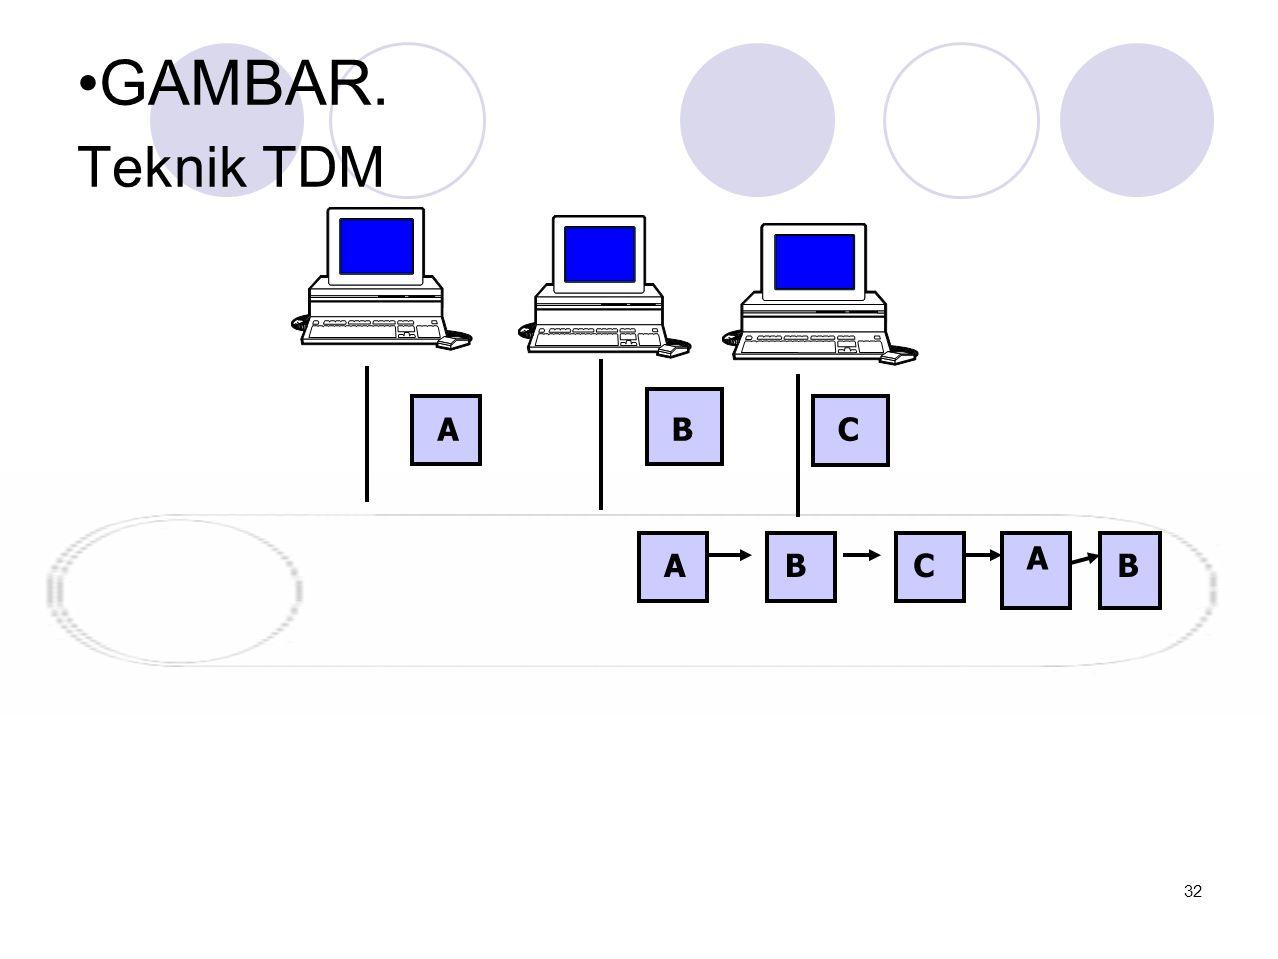 •GAMBAR. Teknik TDM BAC A A BCB 32